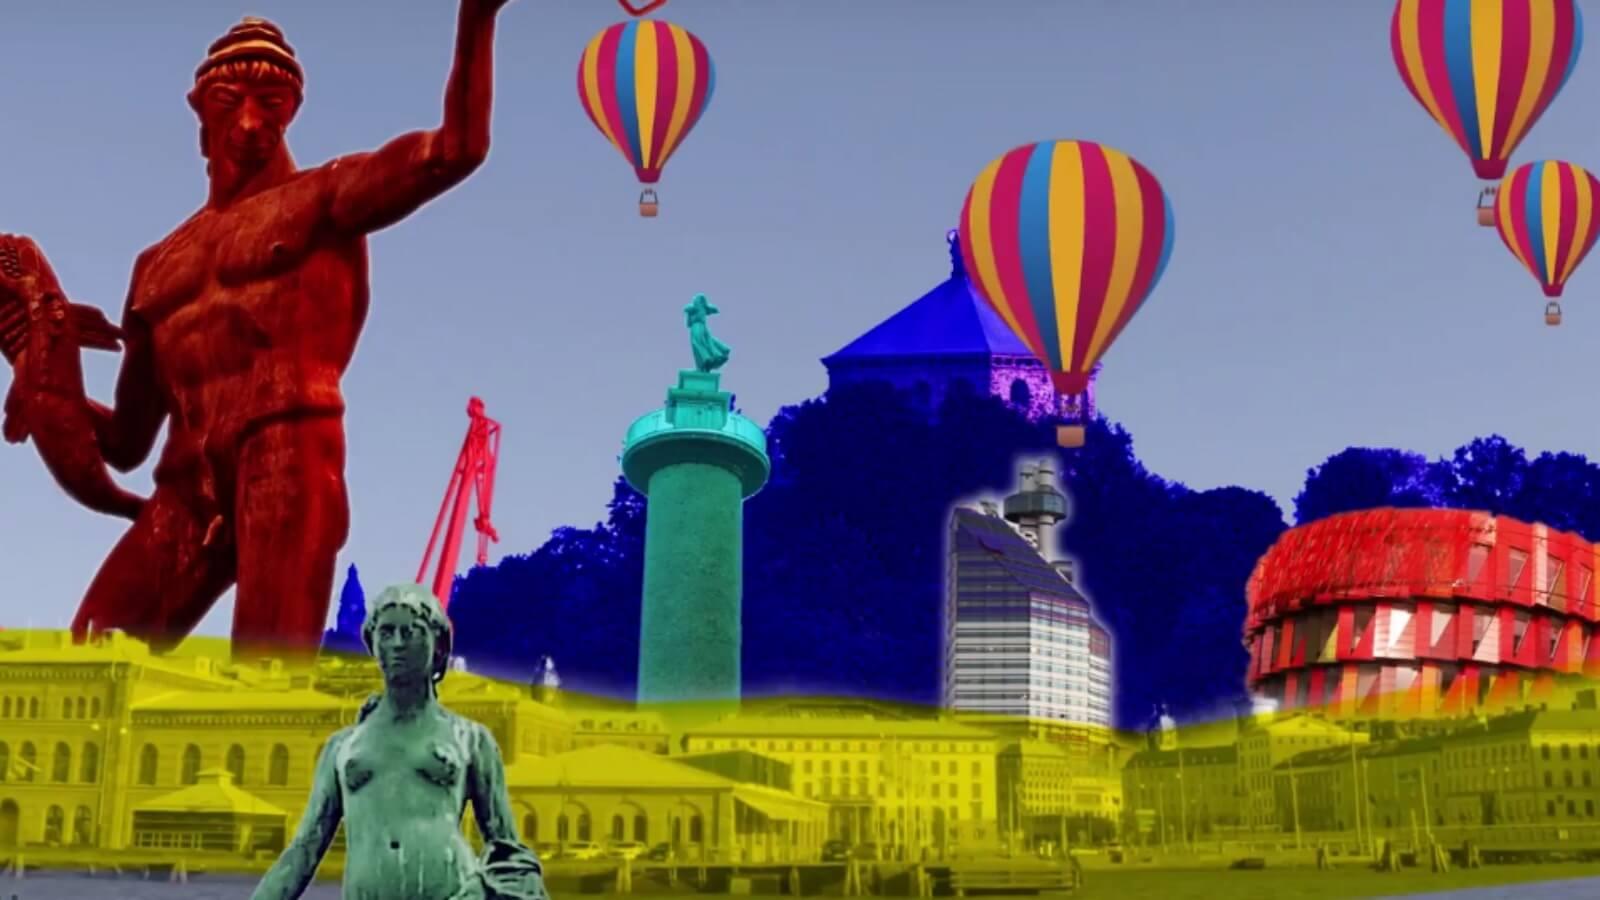 ¡Gothenburg Art 21 busca artistas para su próximo corredor de arte público!